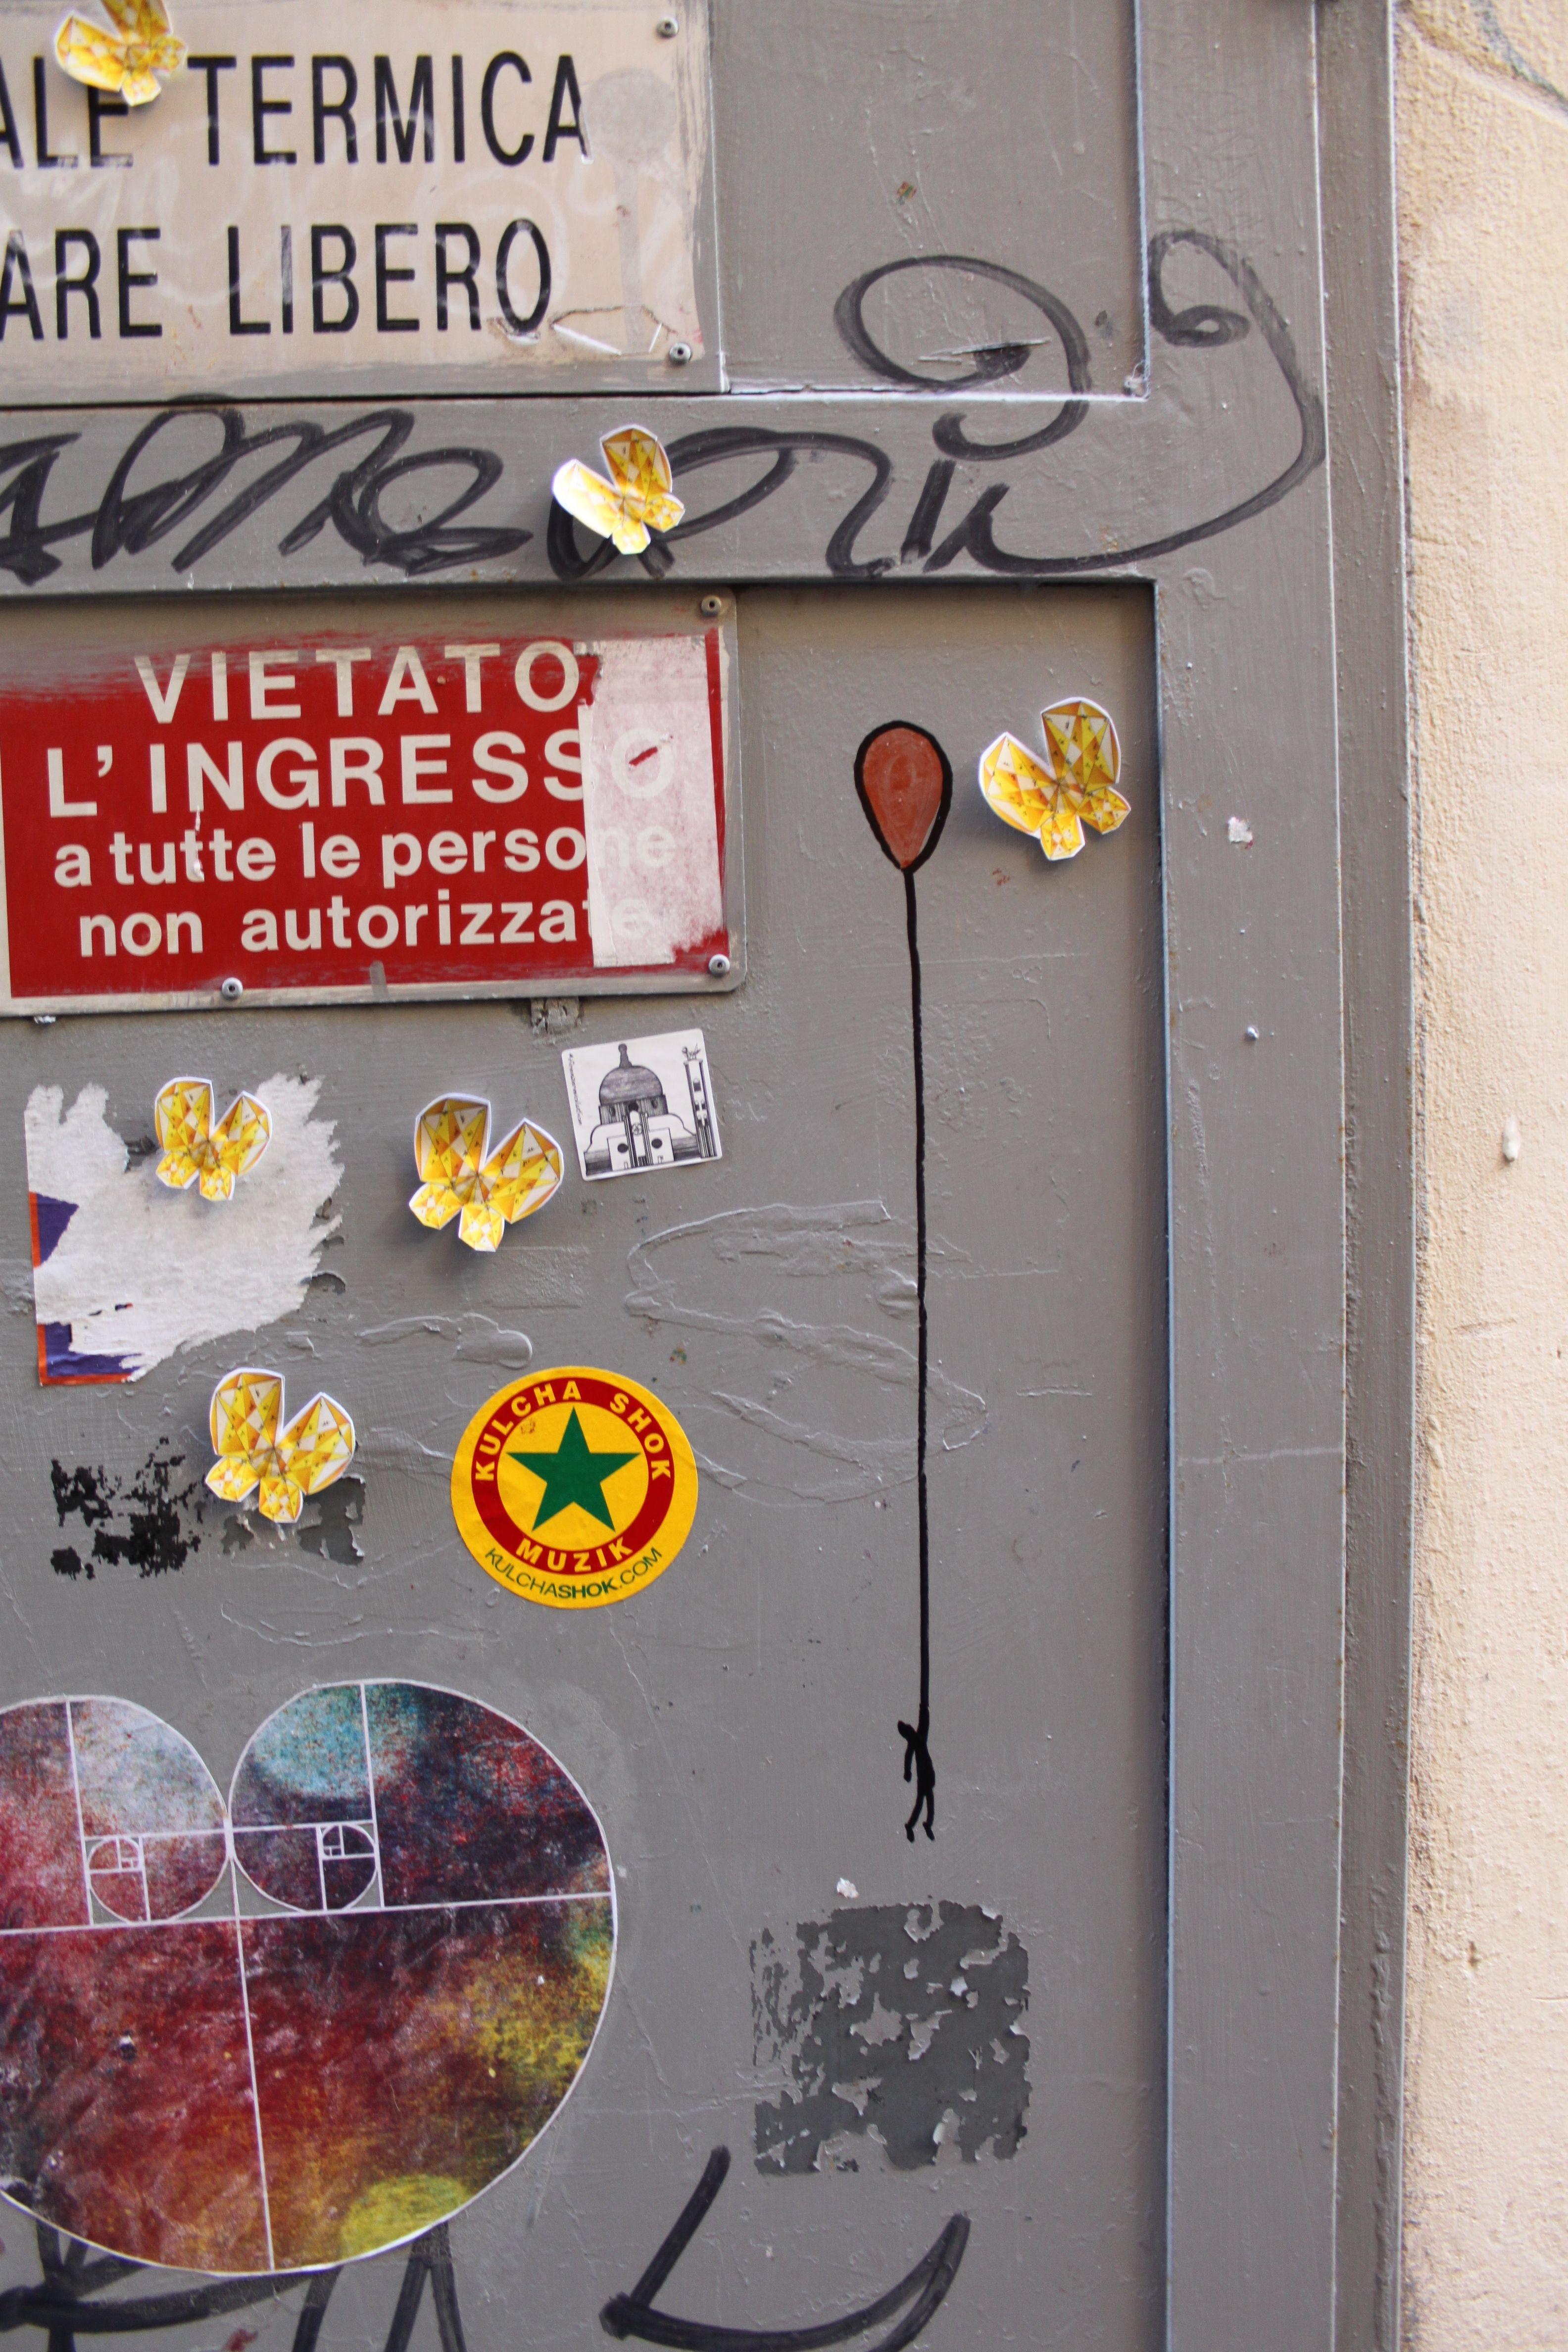 Street art in Florence #Streetart #Florence www.madeoftuscany.it